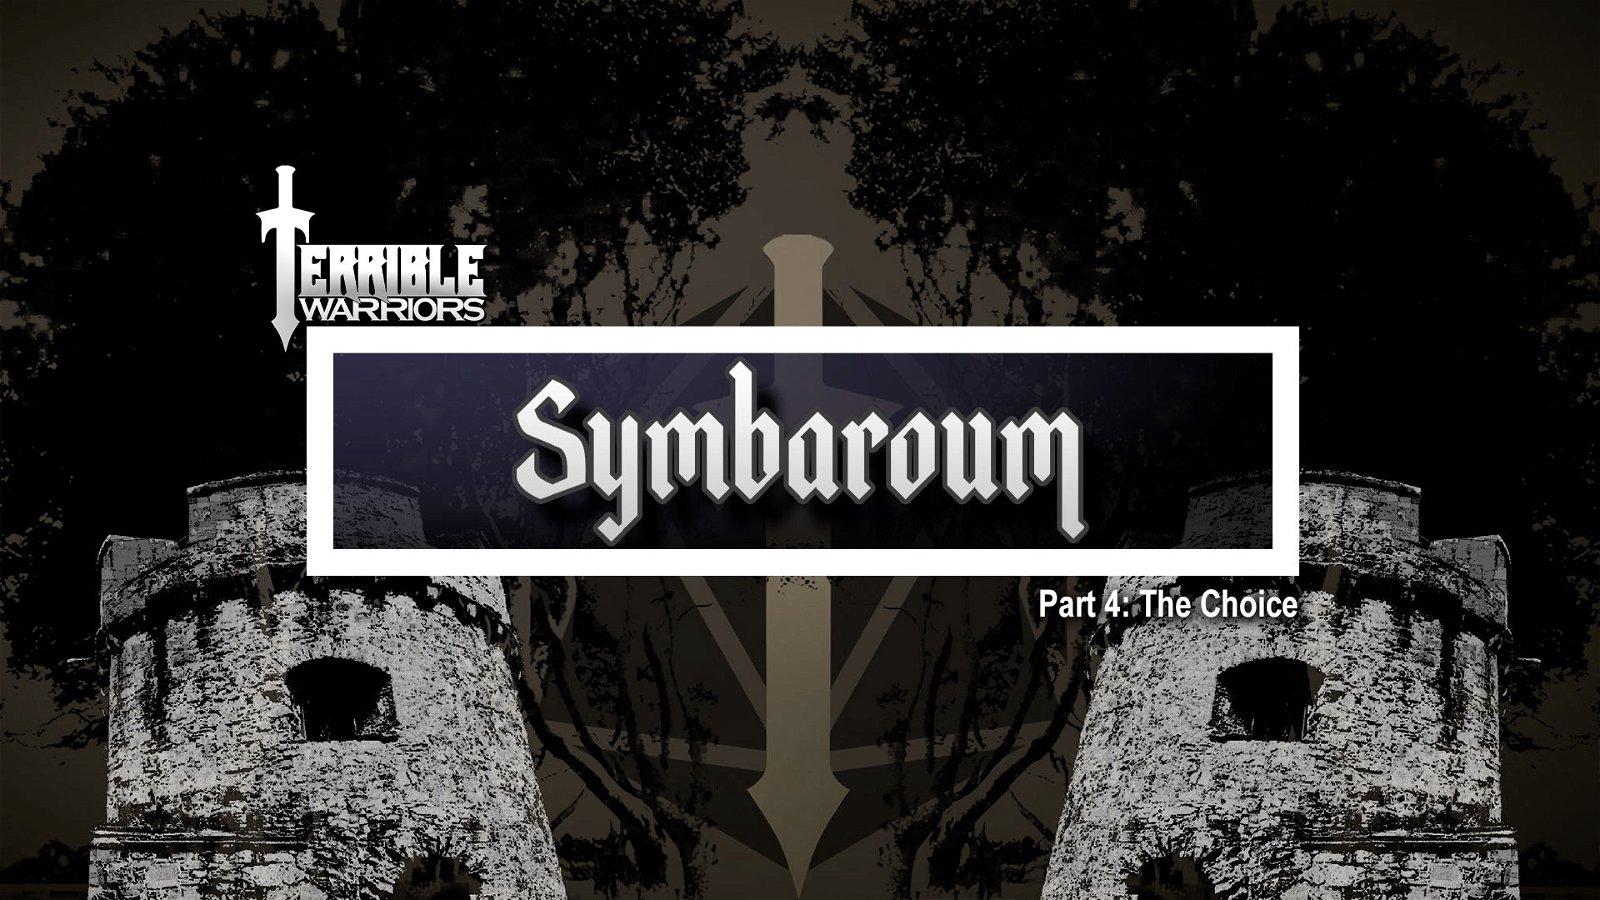 Terrible Warriors: Symbaroum, Part 4